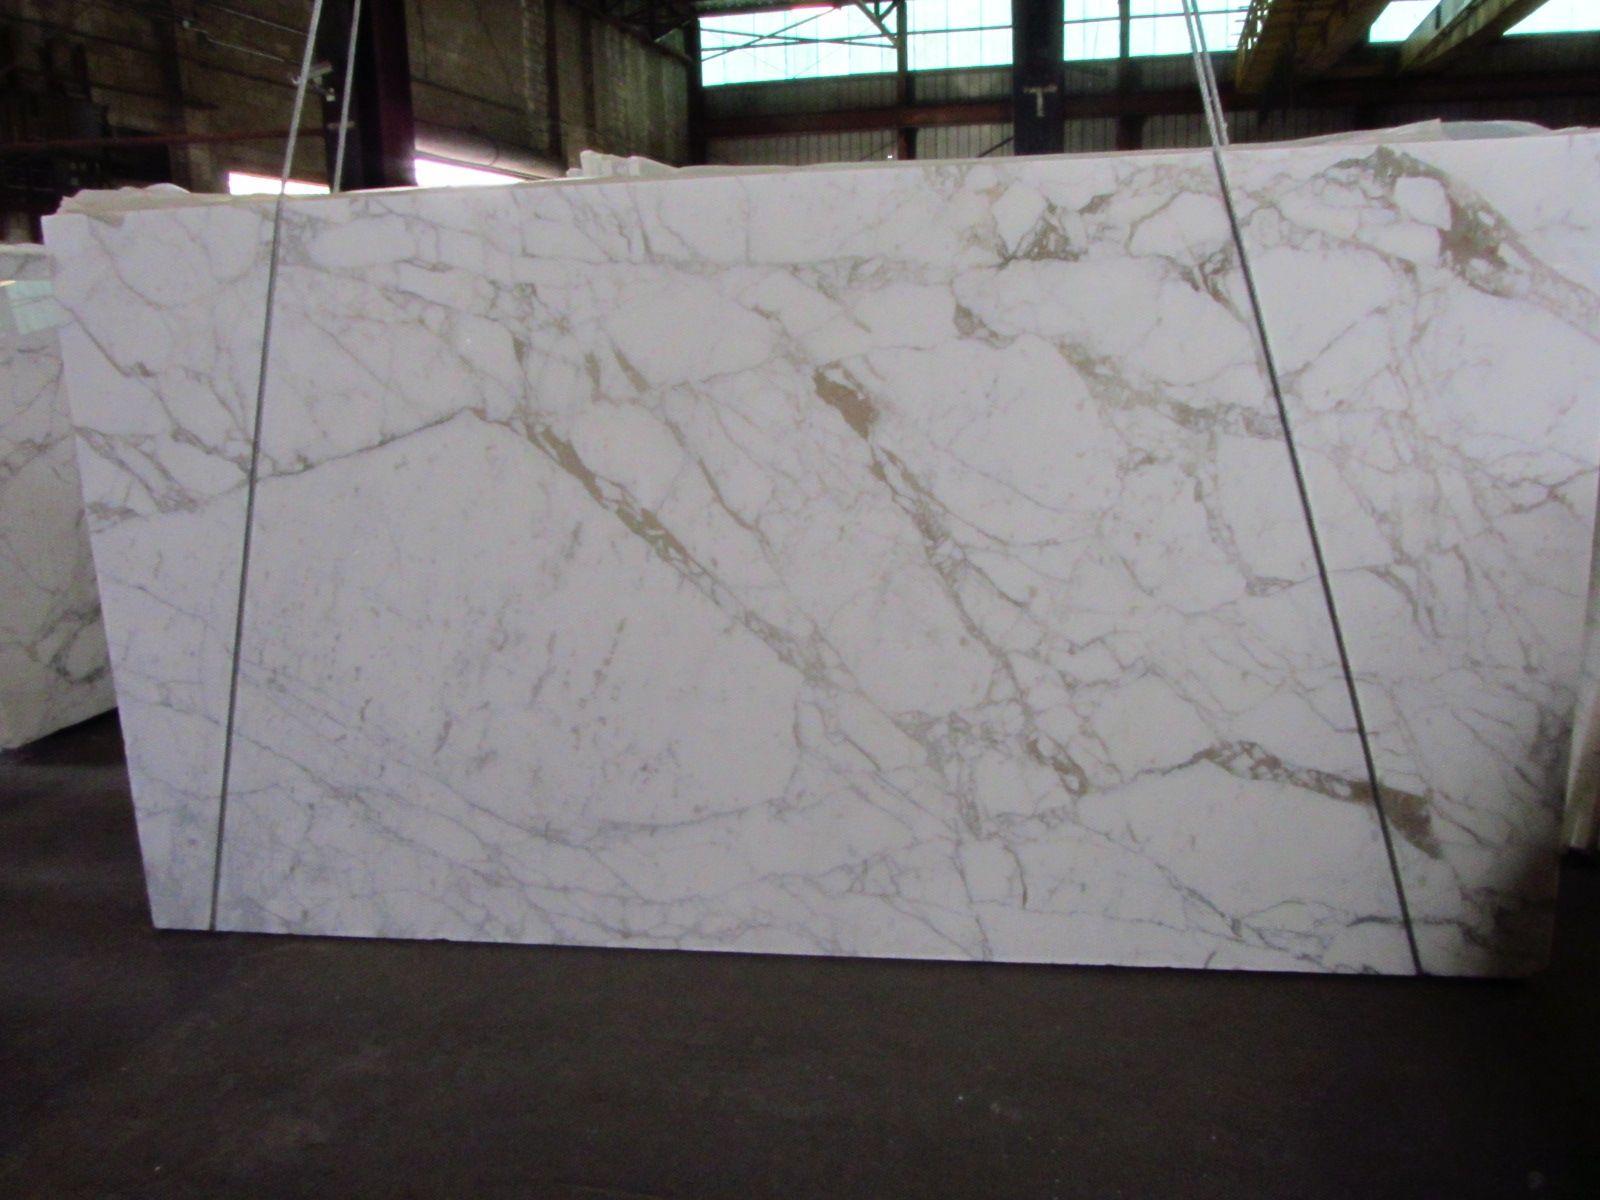 Calacatta Gold Vein Inventory V 132 0402 01 0215 Fiorano Stone